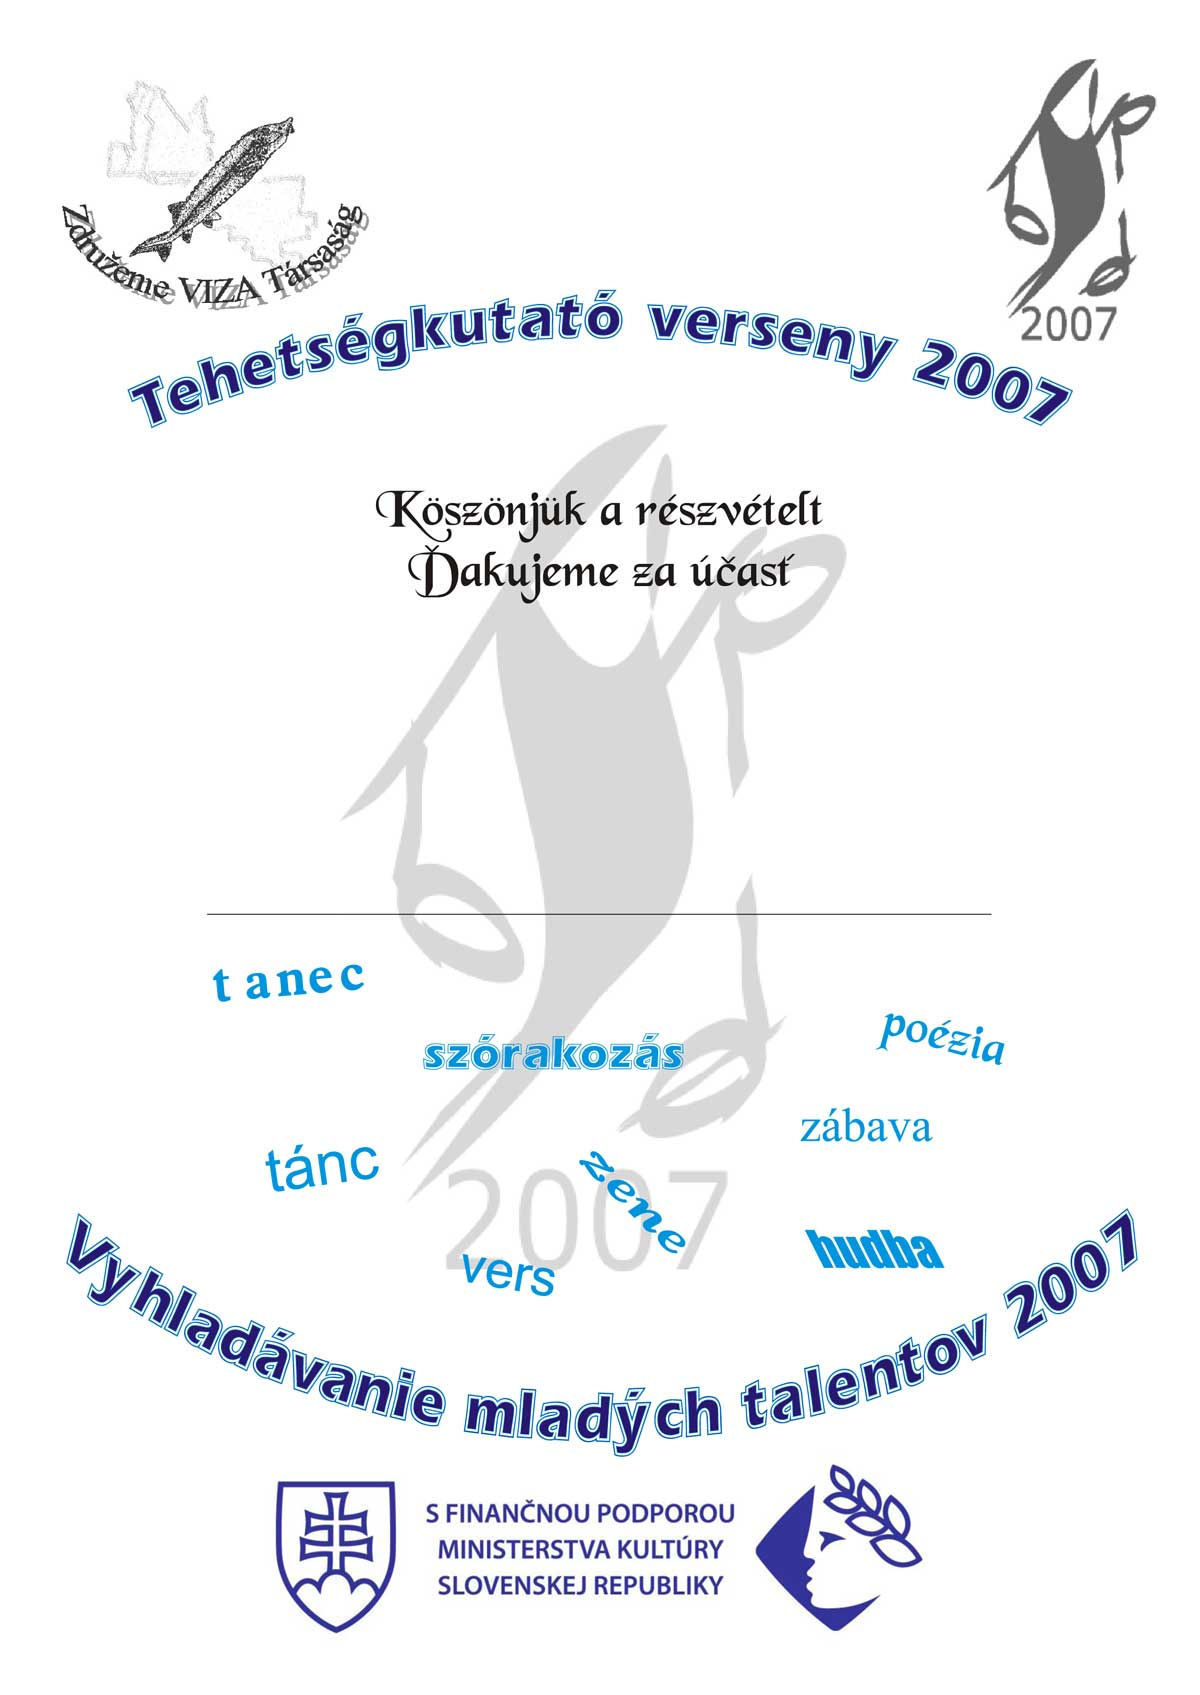 Oklevél - Diplom